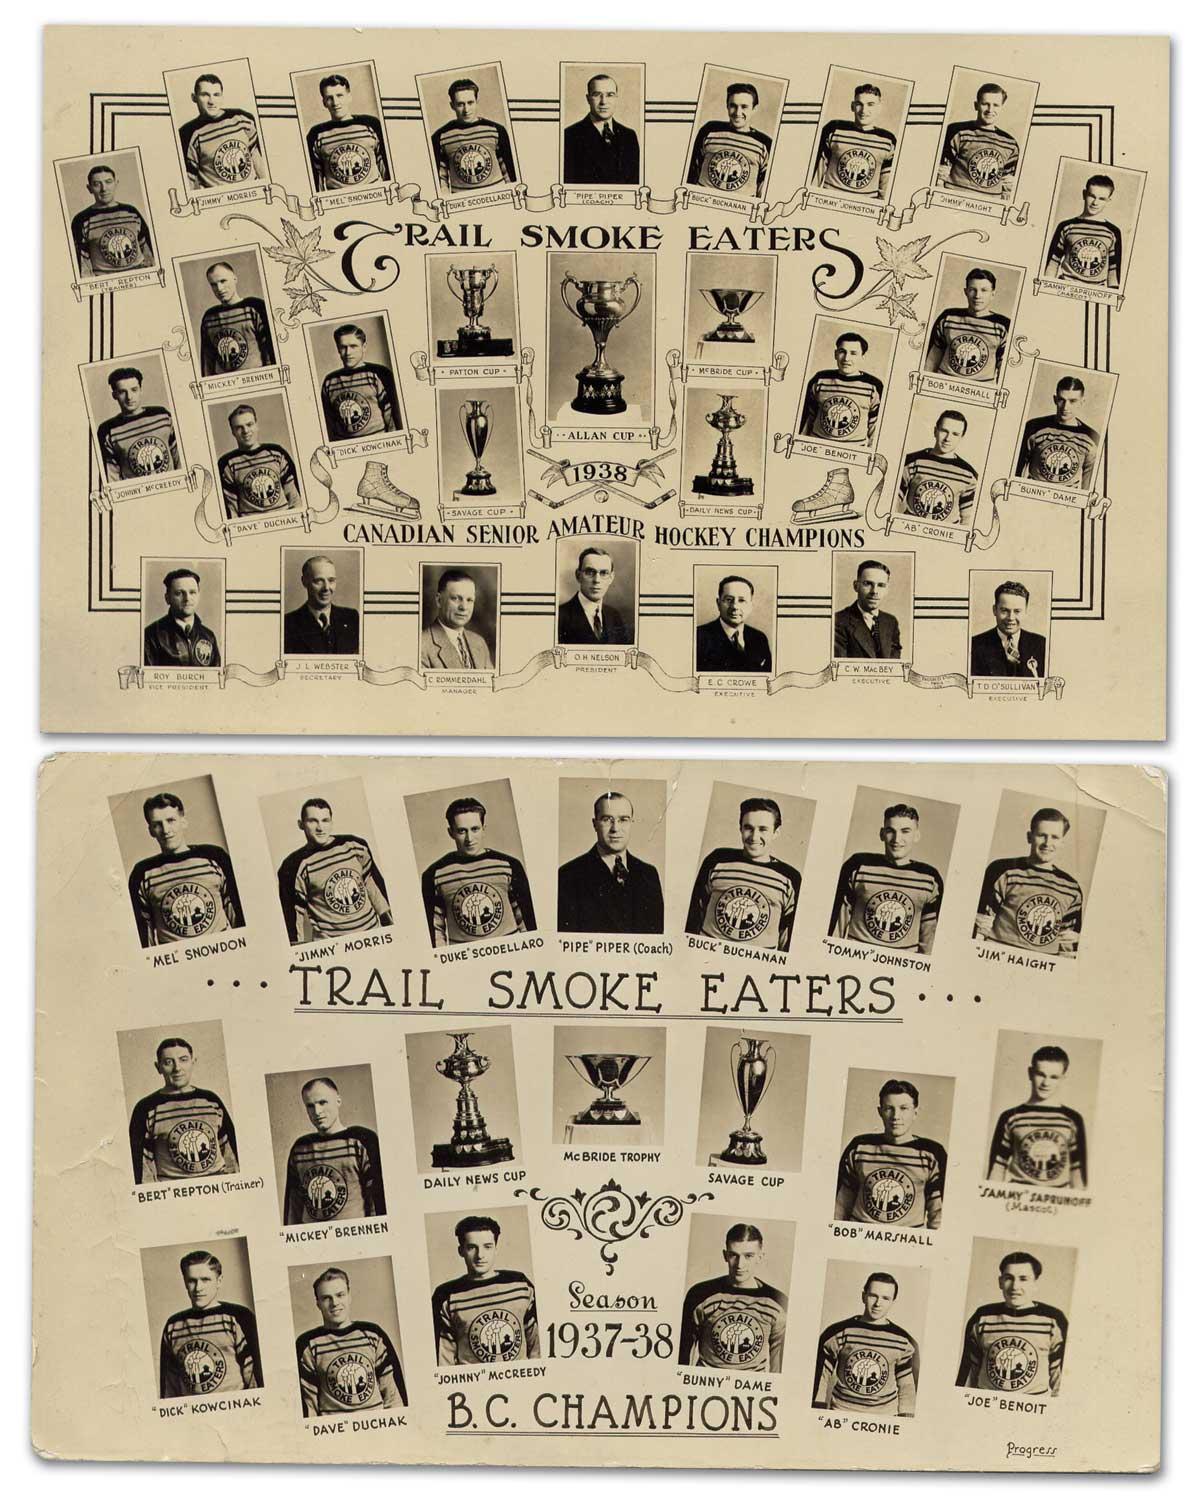 1937-38 British Columbia Senior Playoffs